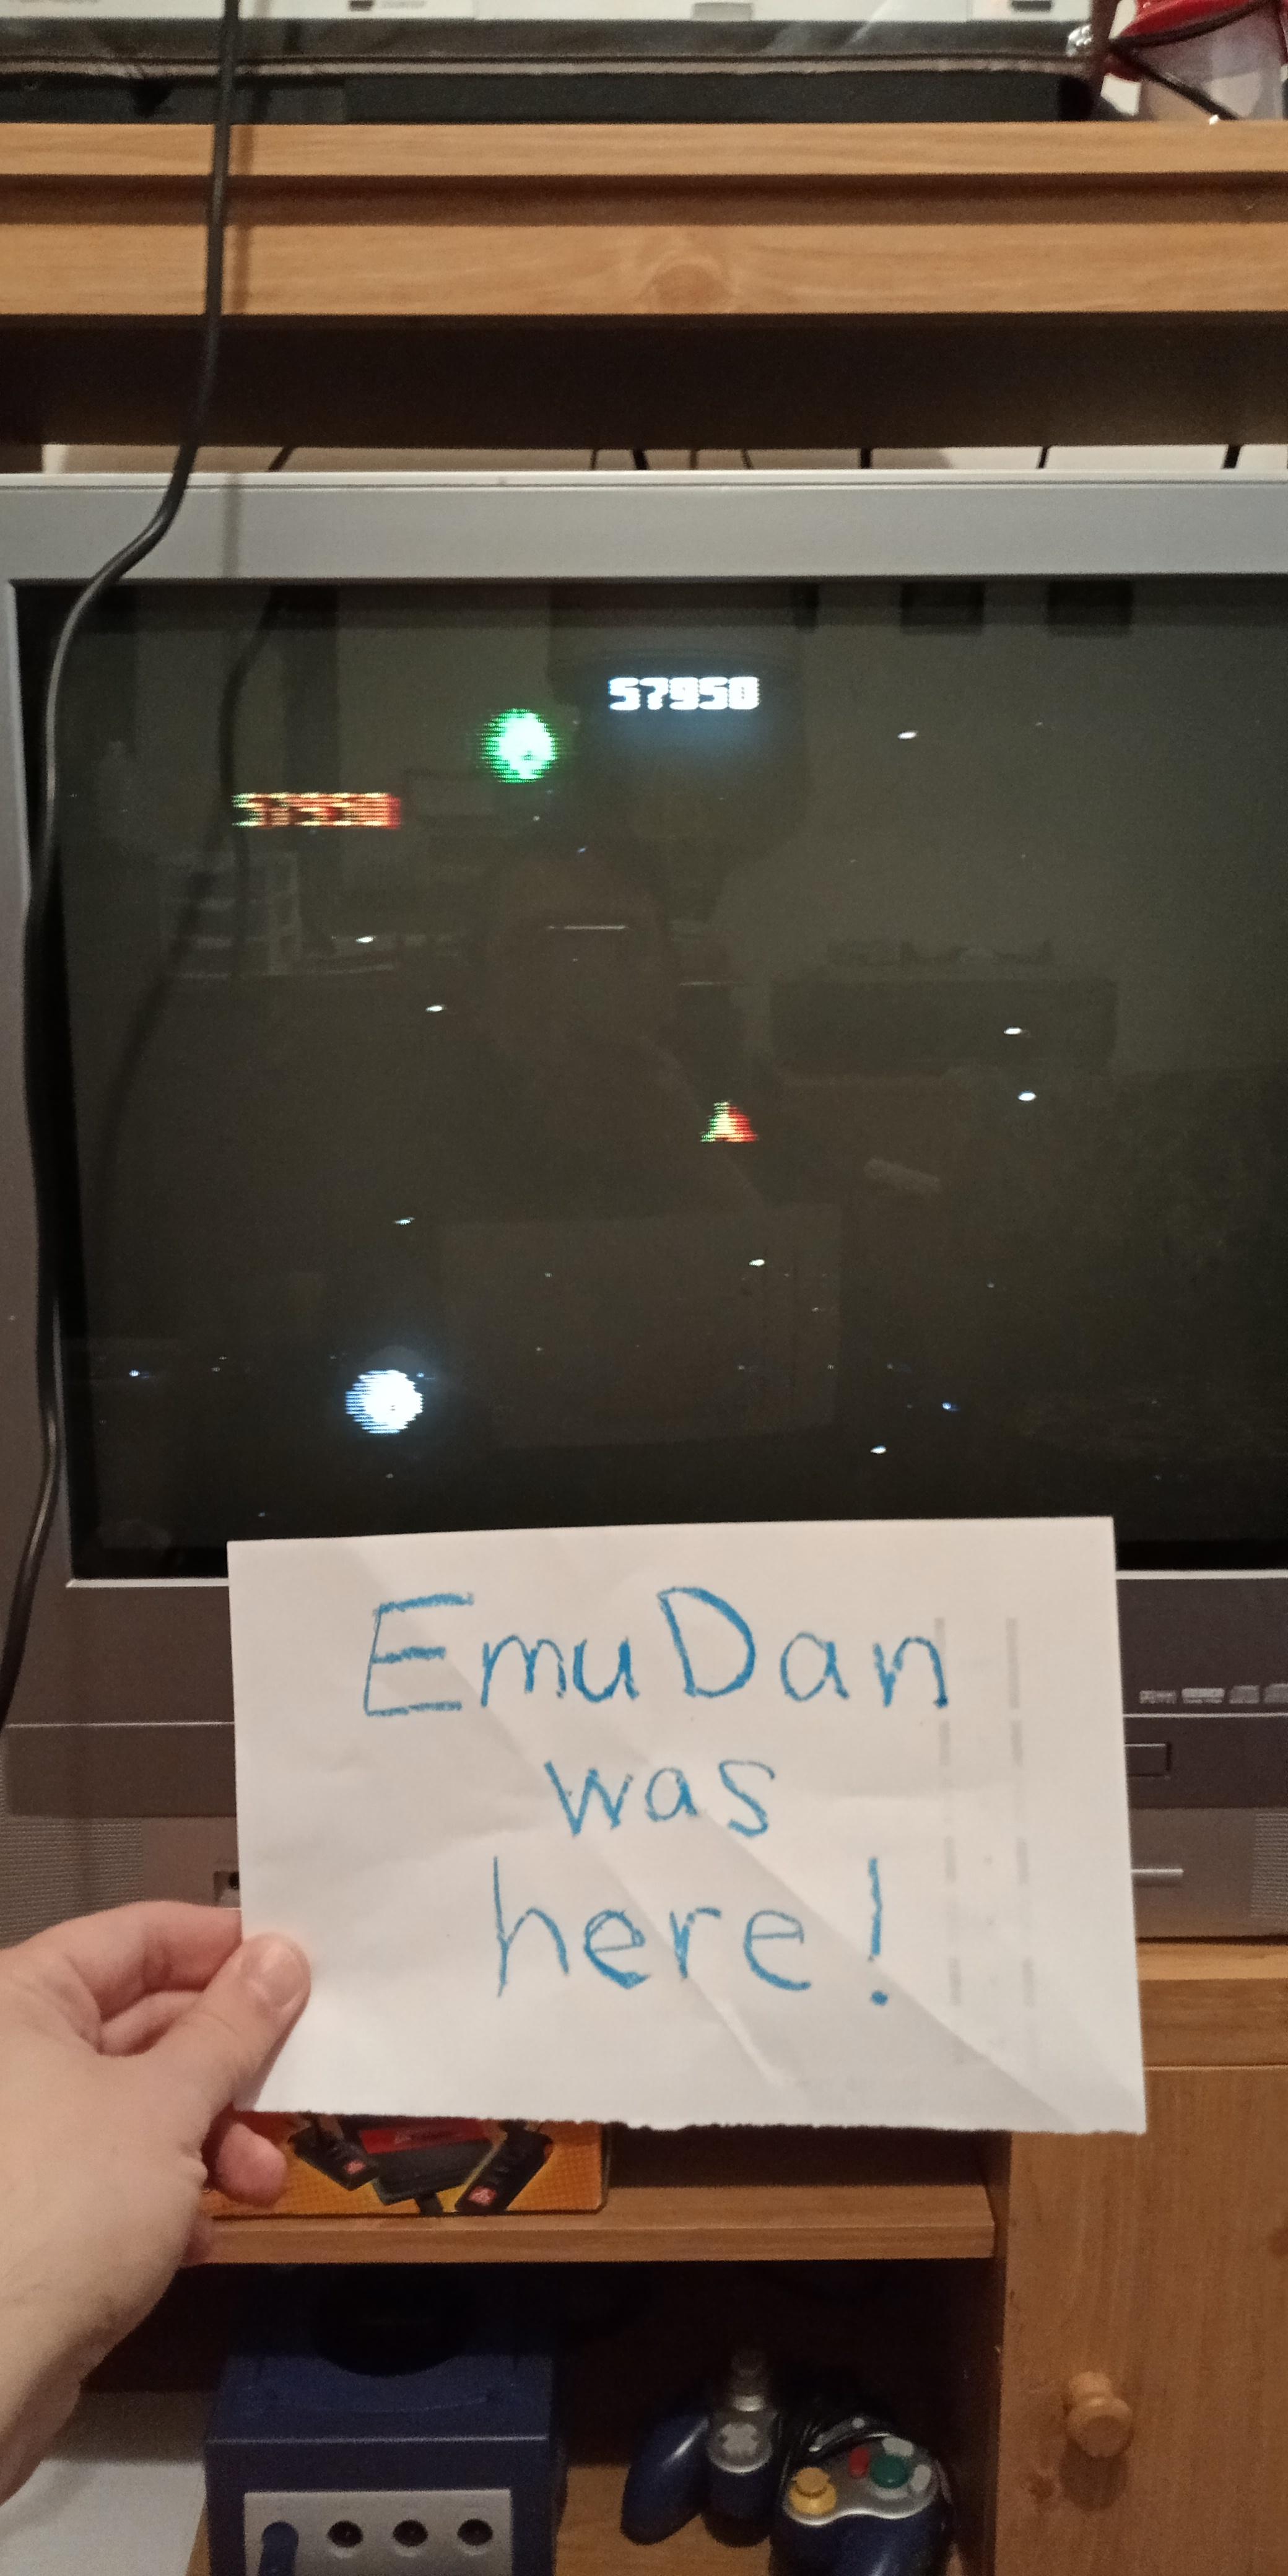 EmuDan: Asteroids: Novice (Atari 7800) 57,950 points on 2019-04-22 09:22:16